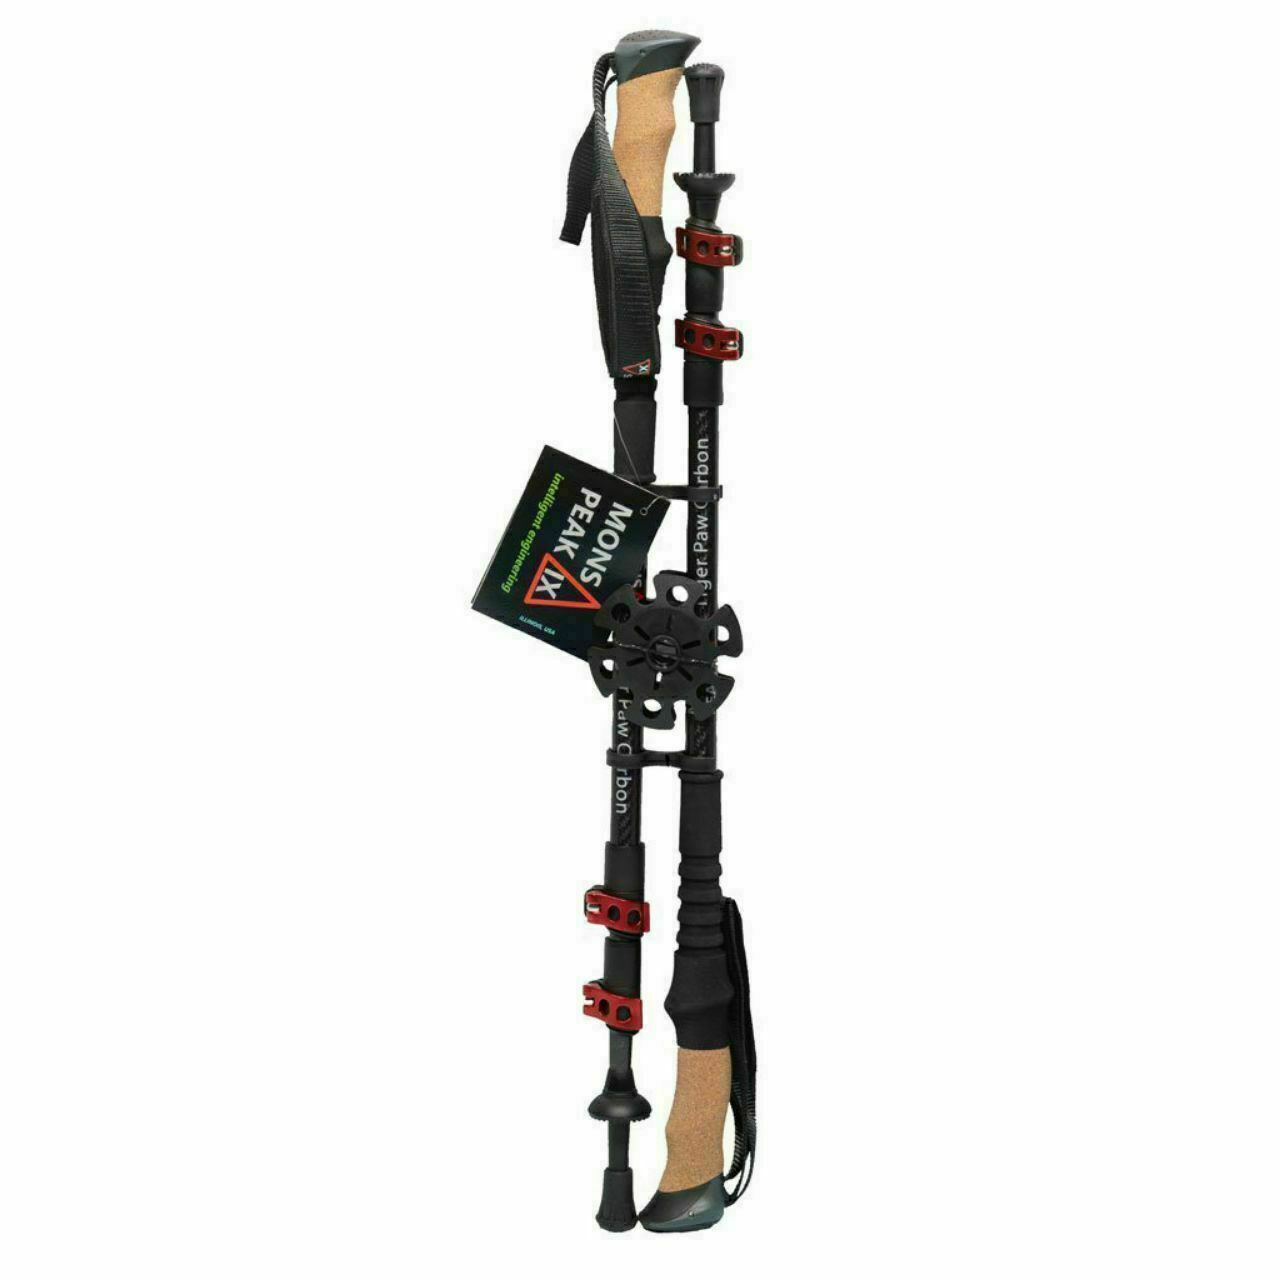 Mons Peak IX Tiger Paw Carbon Fiber Adjustable Hiking/Trekking Poles 24.5